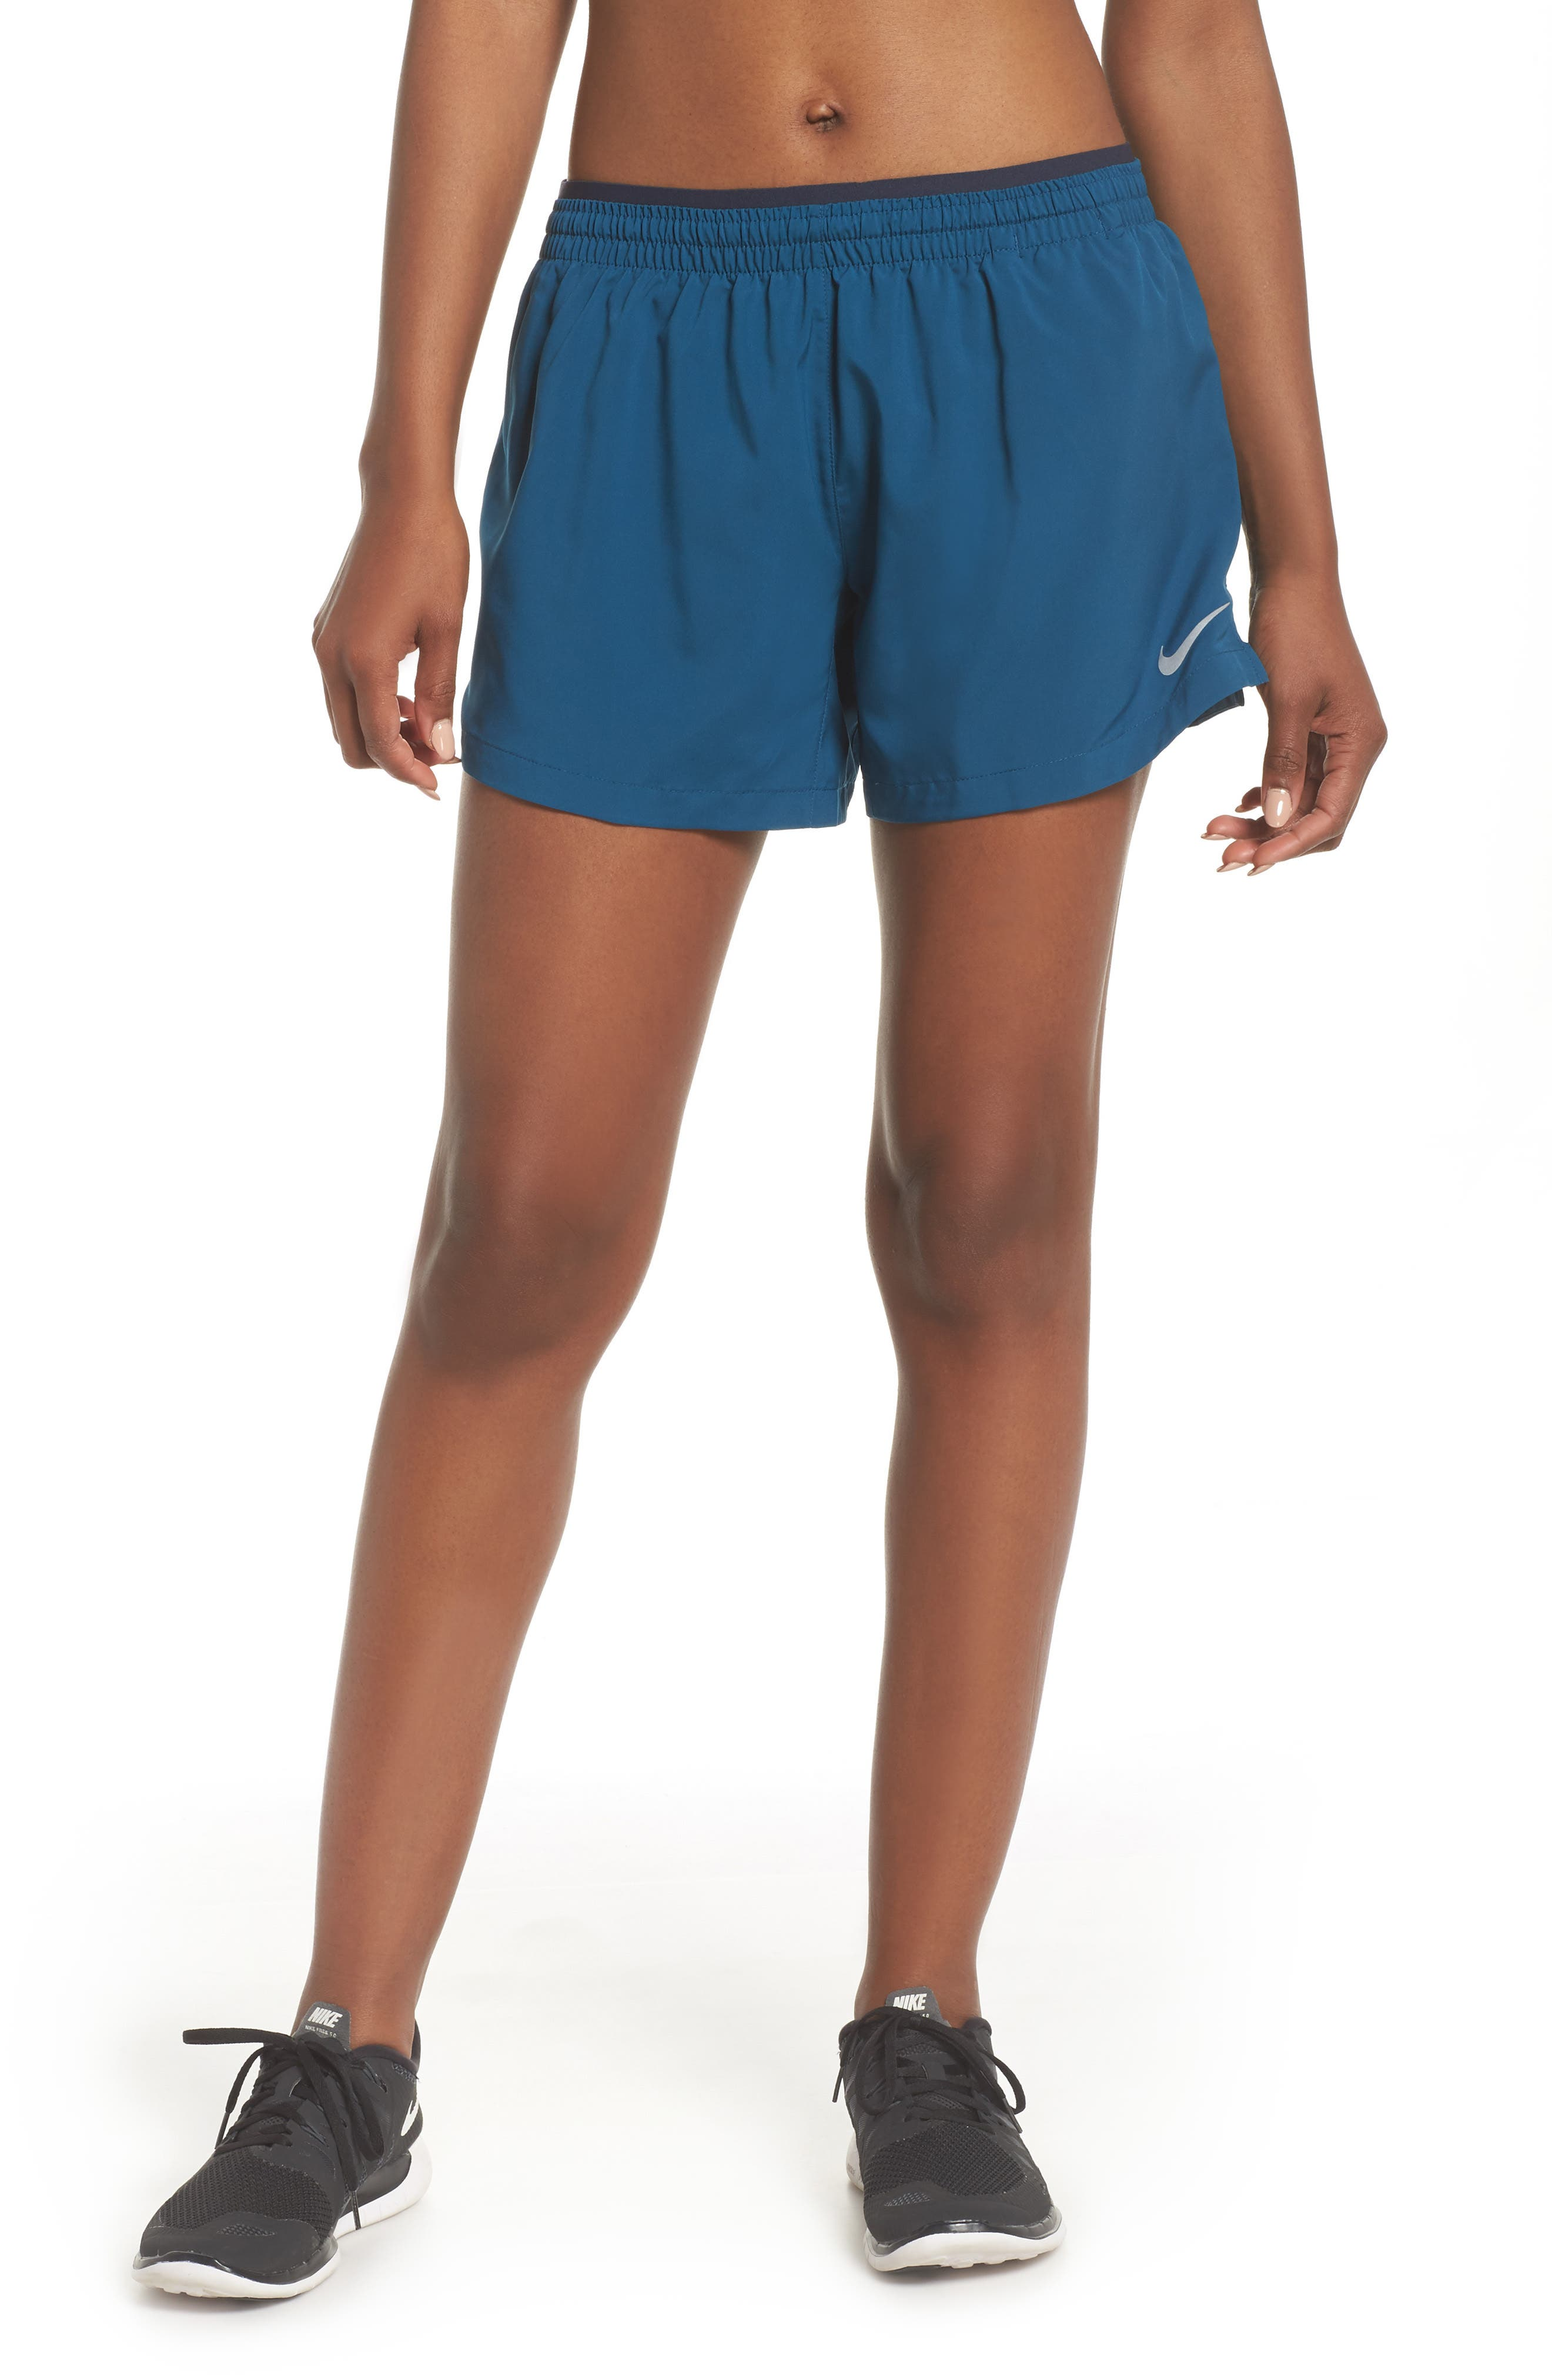 Flex Running Shorts,                             Main thumbnail 1, color,                             Blue Force/ Obsidian